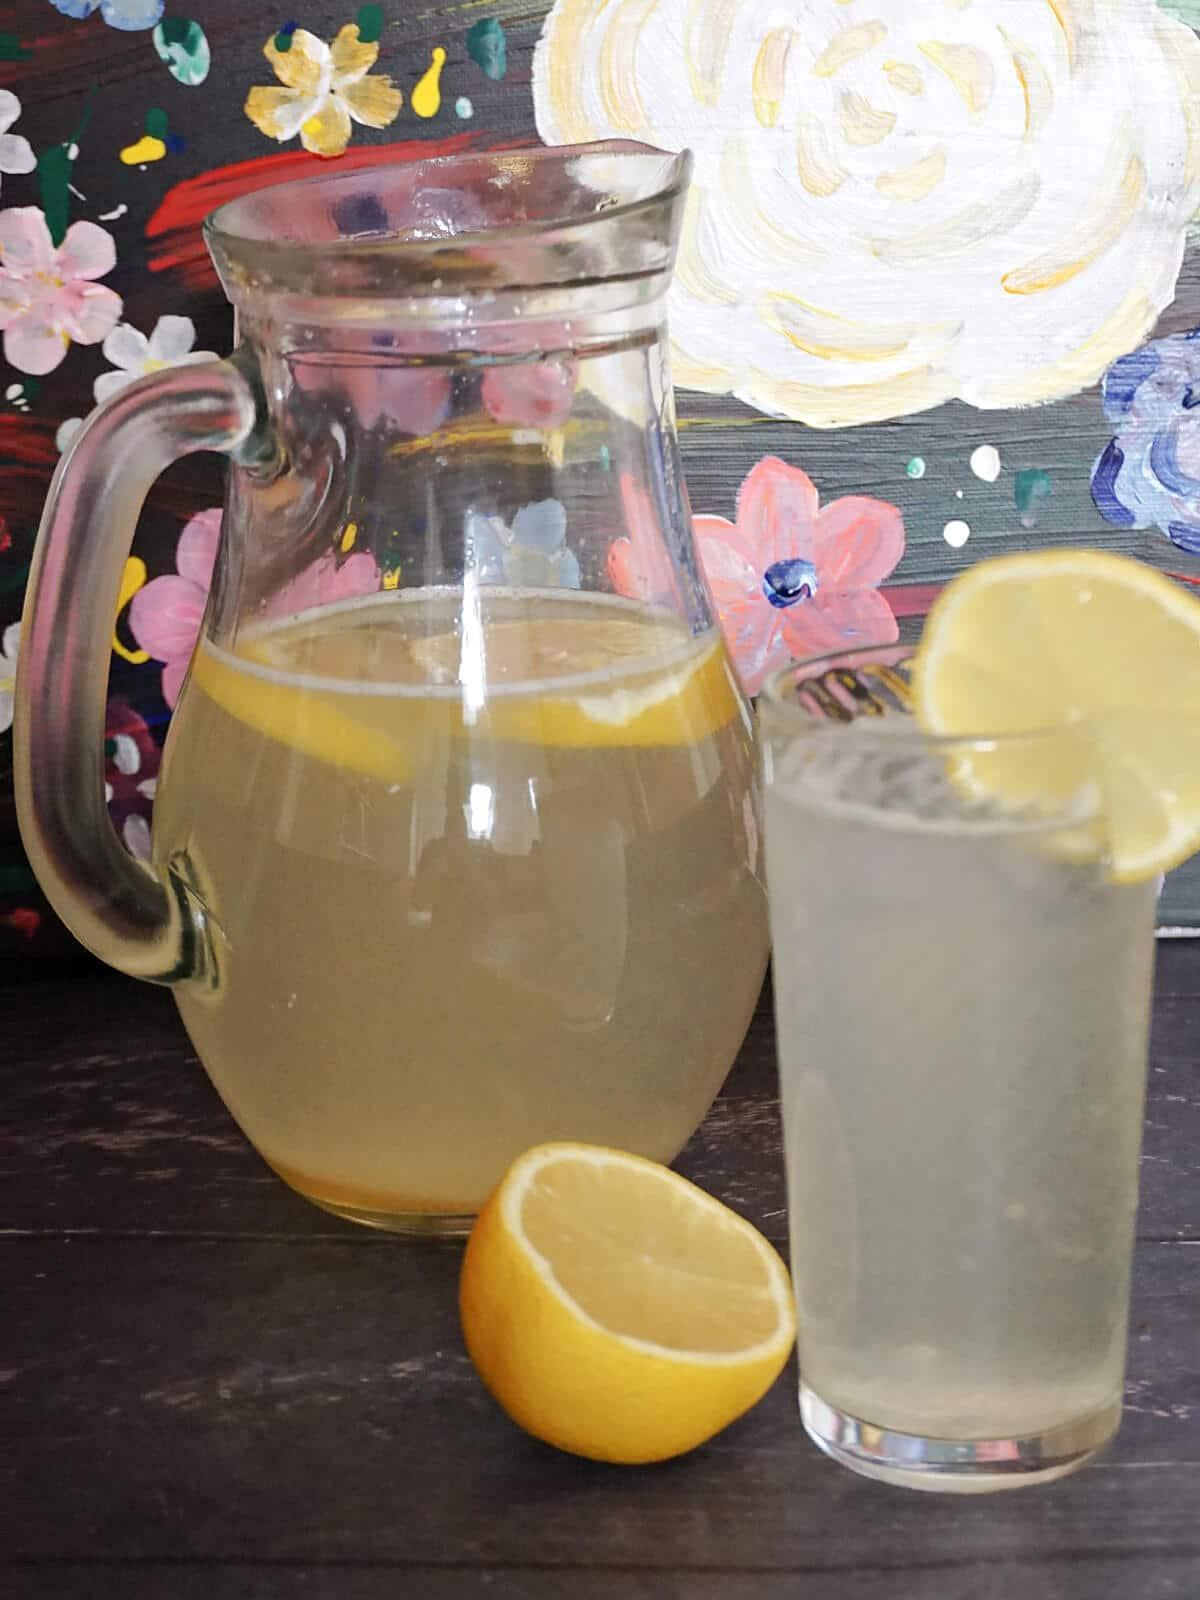 A jug and a glass of lemonade